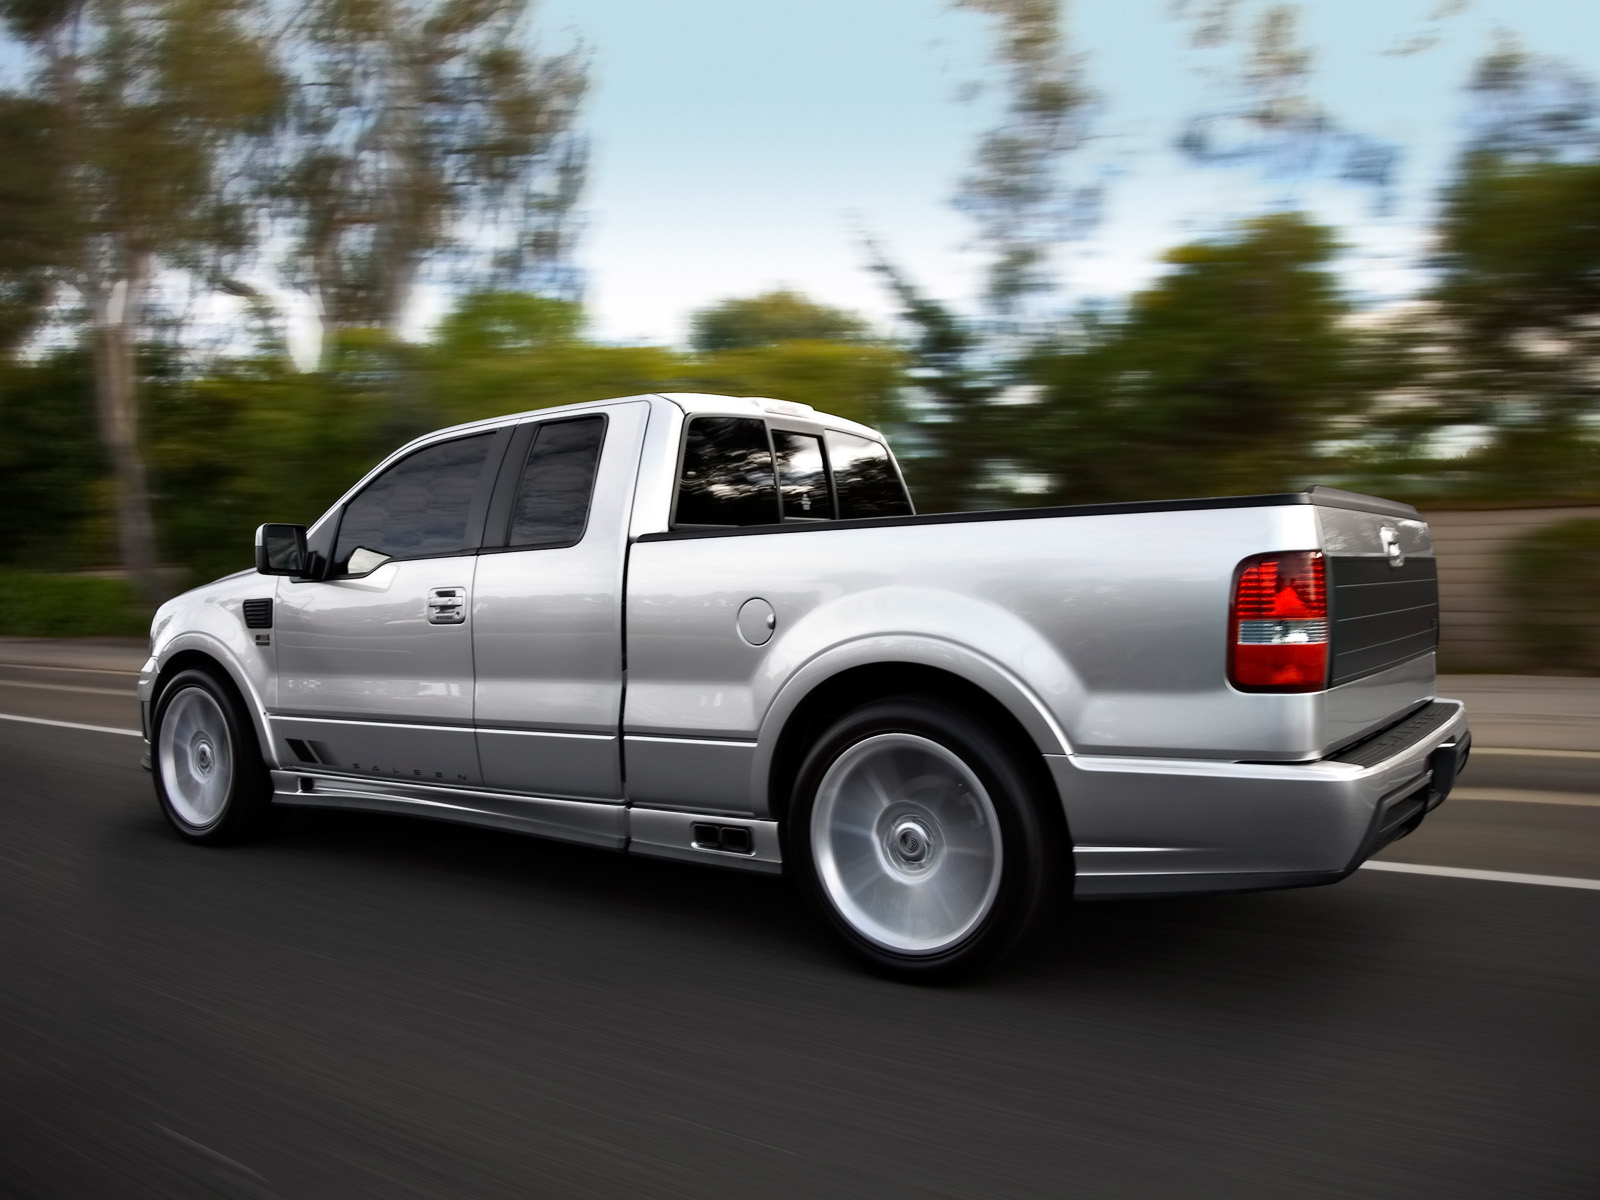 3dtuning of ford f 150 saleen pickup 2010 unique on line car configurator for. Black Bedroom Furniture Sets. Home Design Ideas